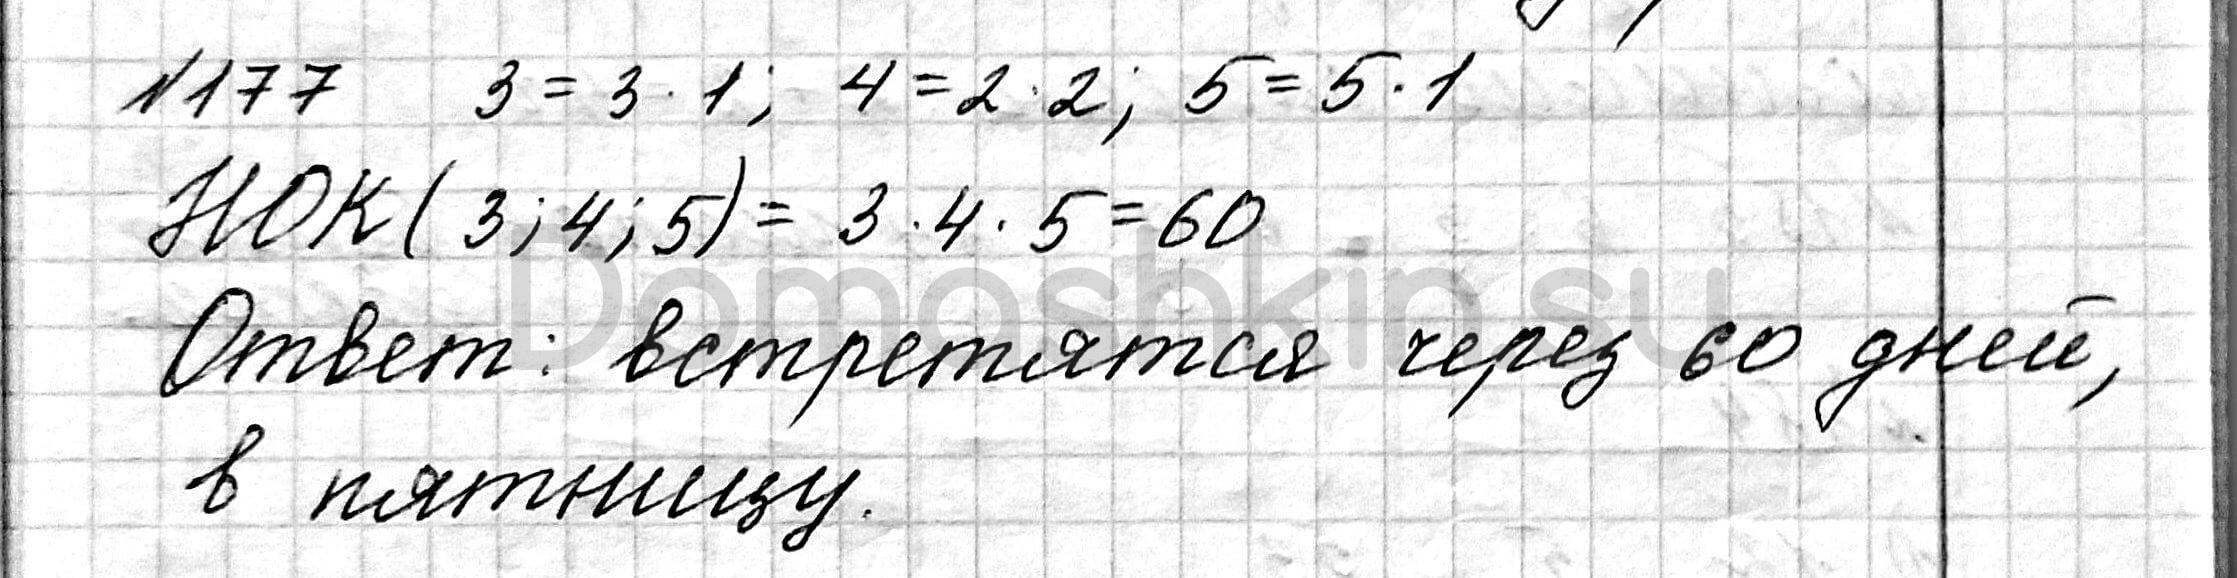 Математика 6 класс учебник Мерзляк номер 177 решение